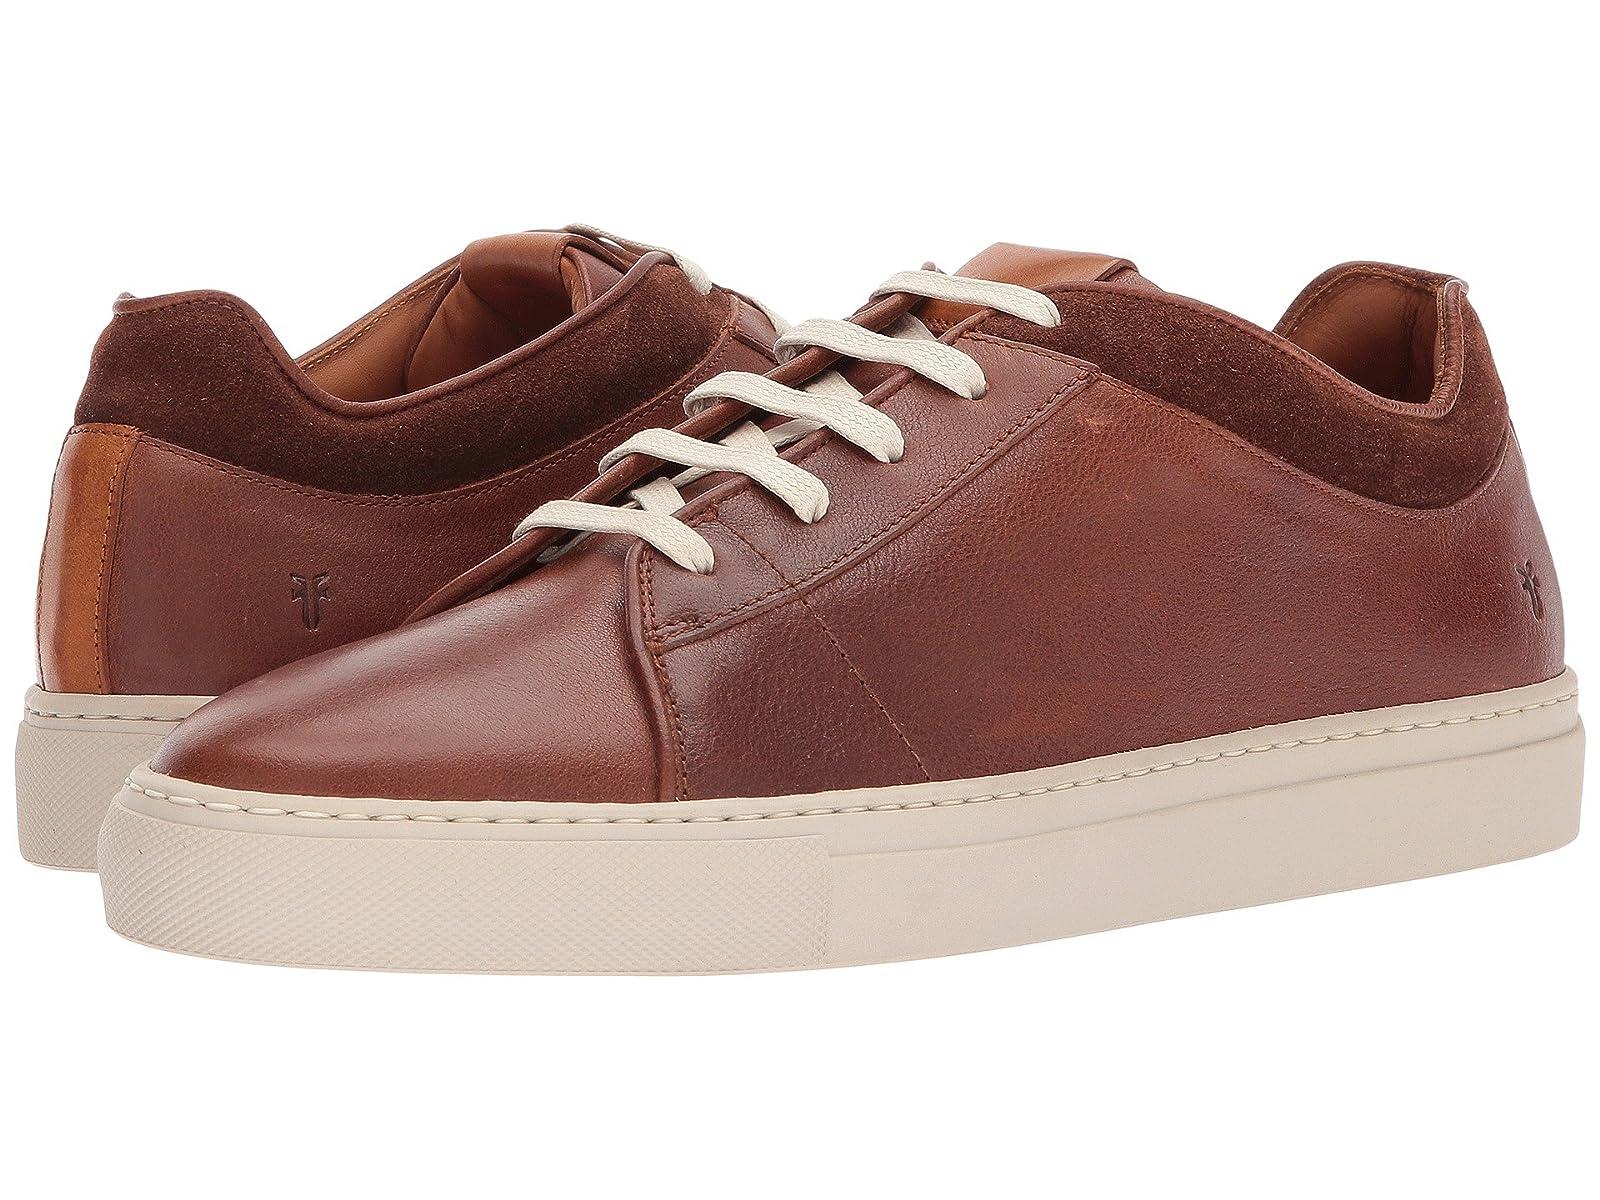 Frye Owen OxfordCheap and distinctive eye-catching shoes